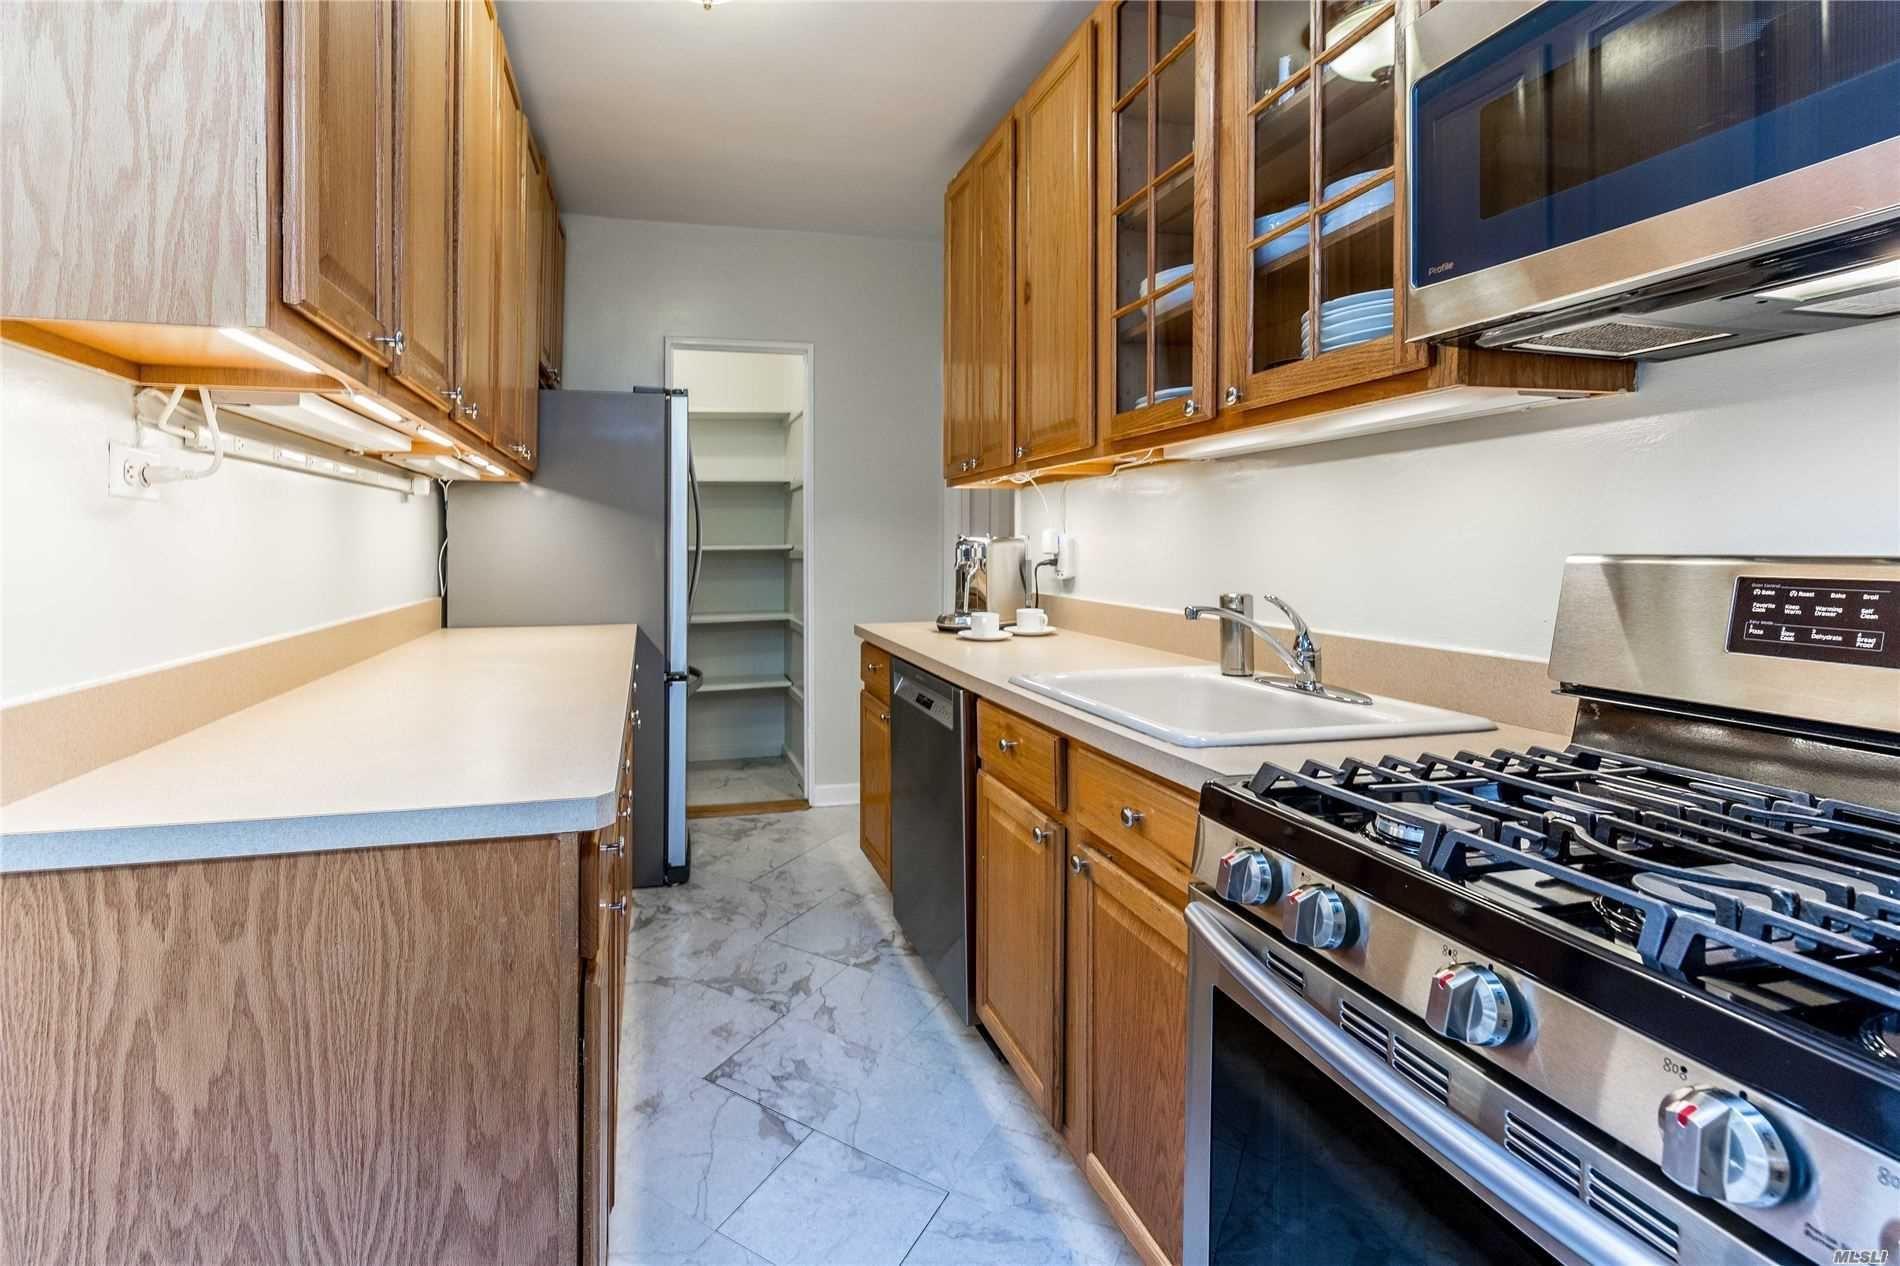 67-38 108 Street #D21, Forest Hills, NY 11375 - MLS#: 3242688